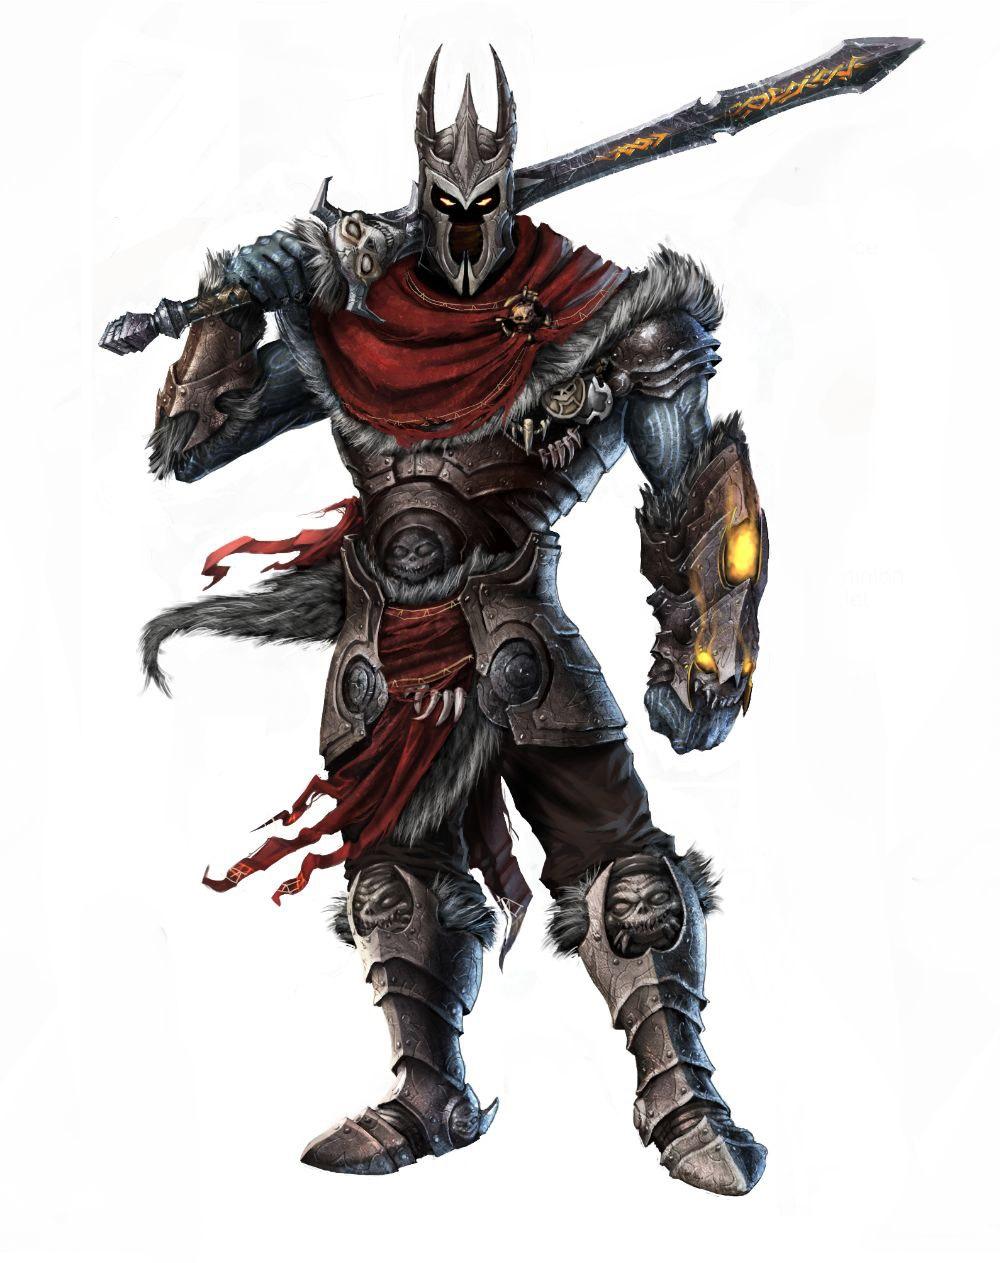 Ballz new armor